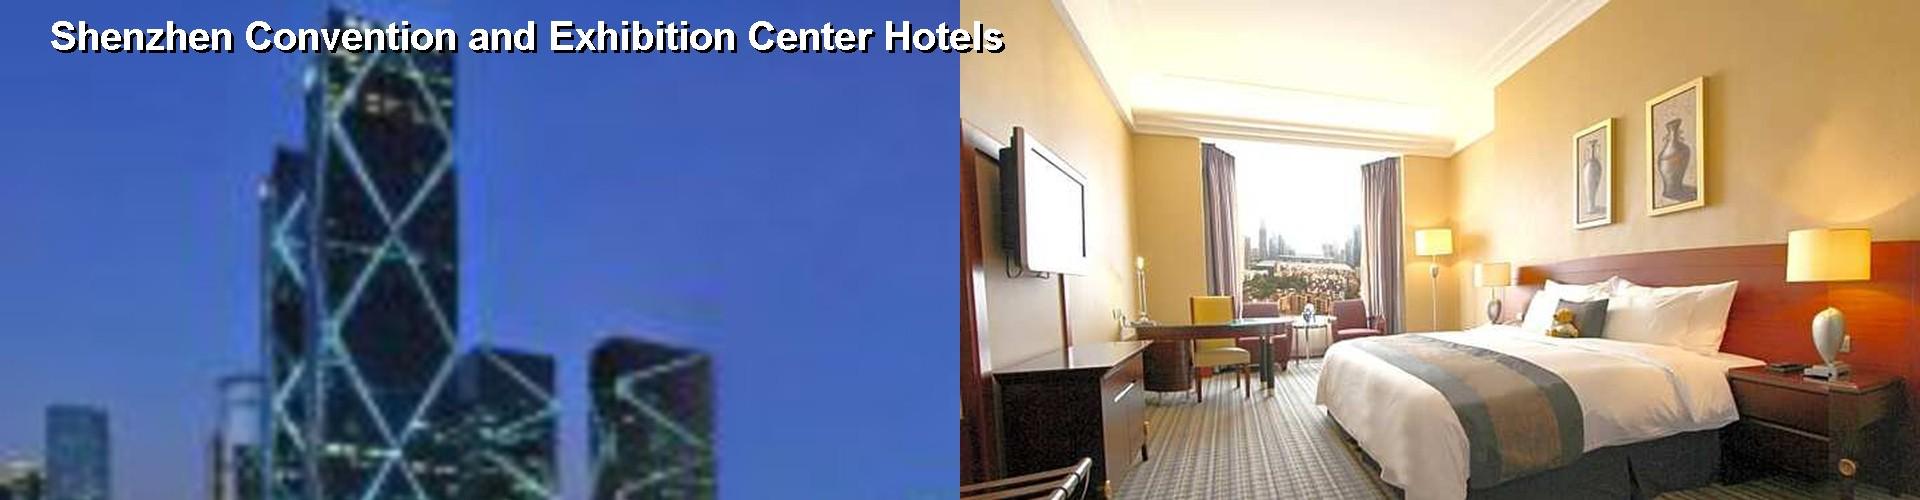 Finest Hotels Near Shenzhen Convention And Exhibition Center